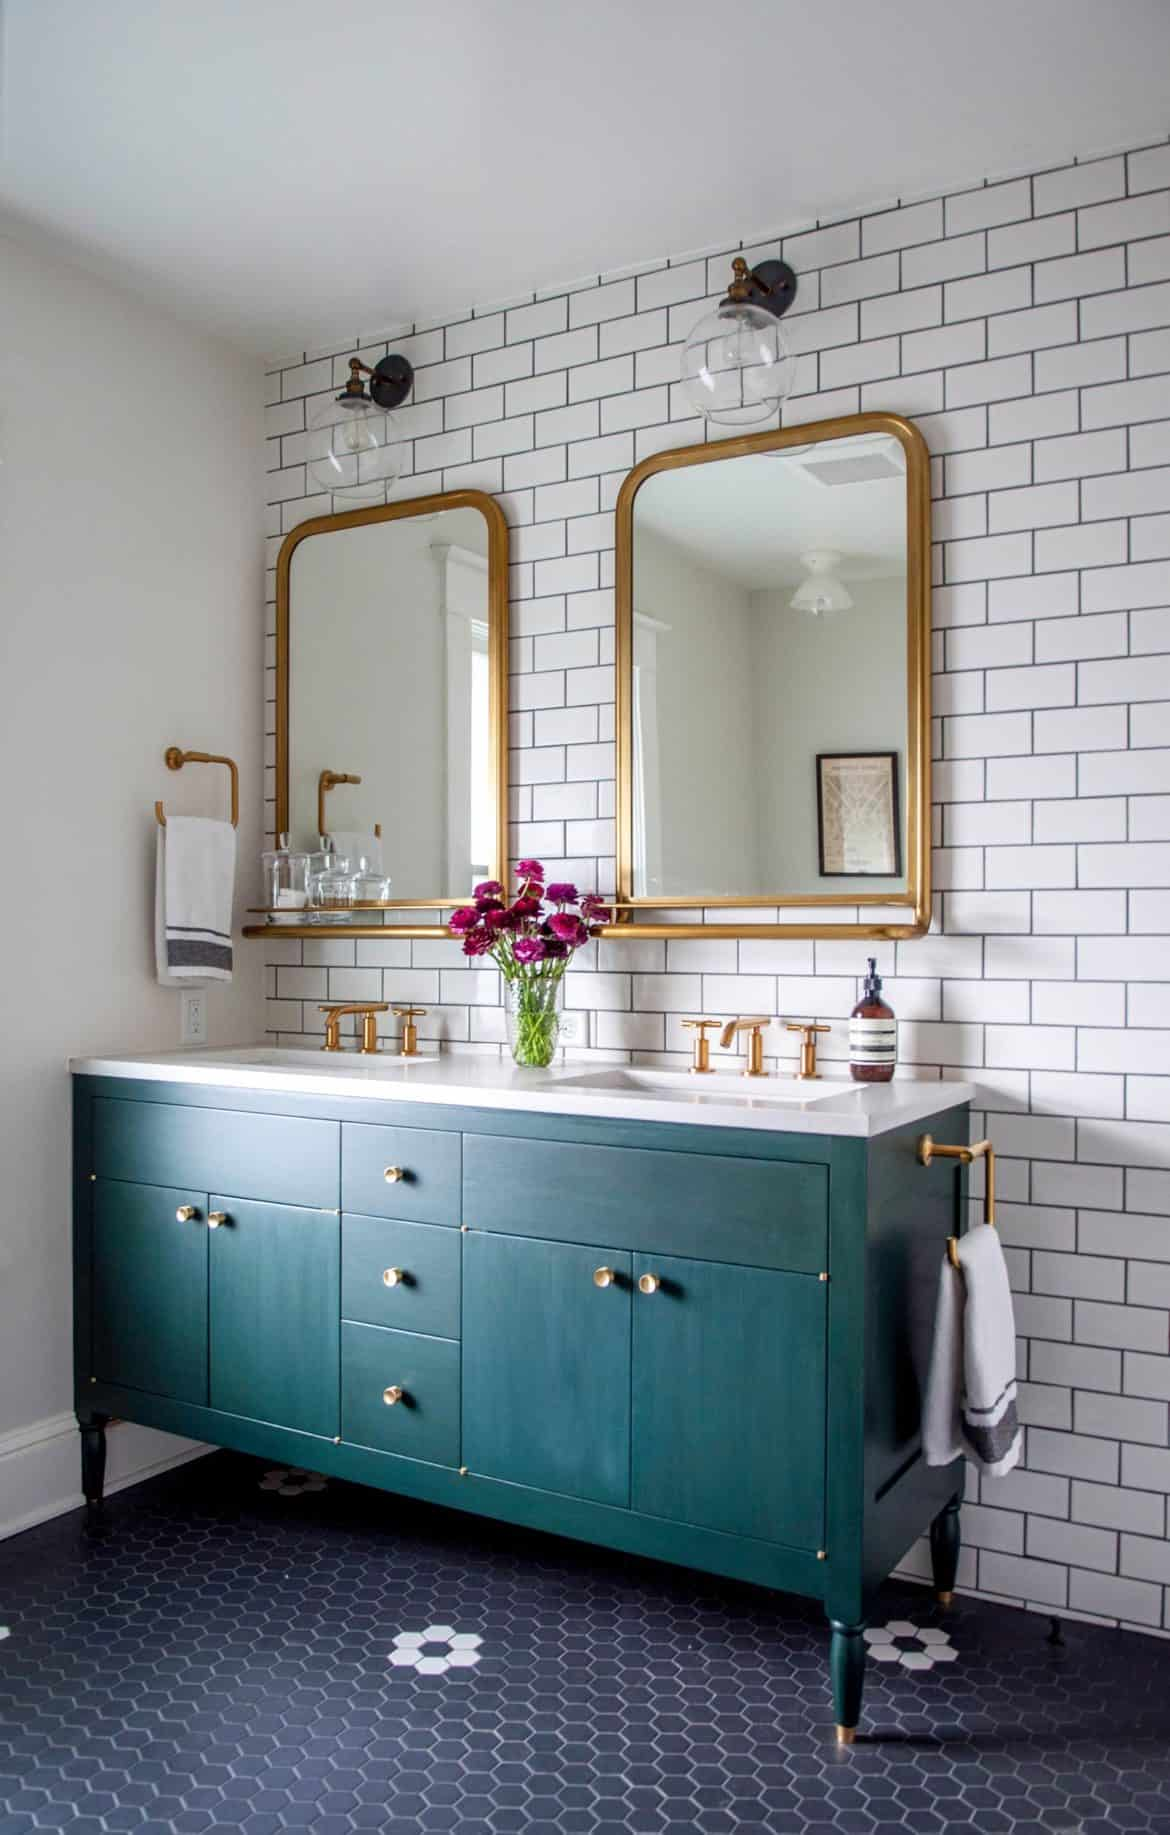 Modern Vintage Bathroom Inspiration Making Joy And Pretty Things